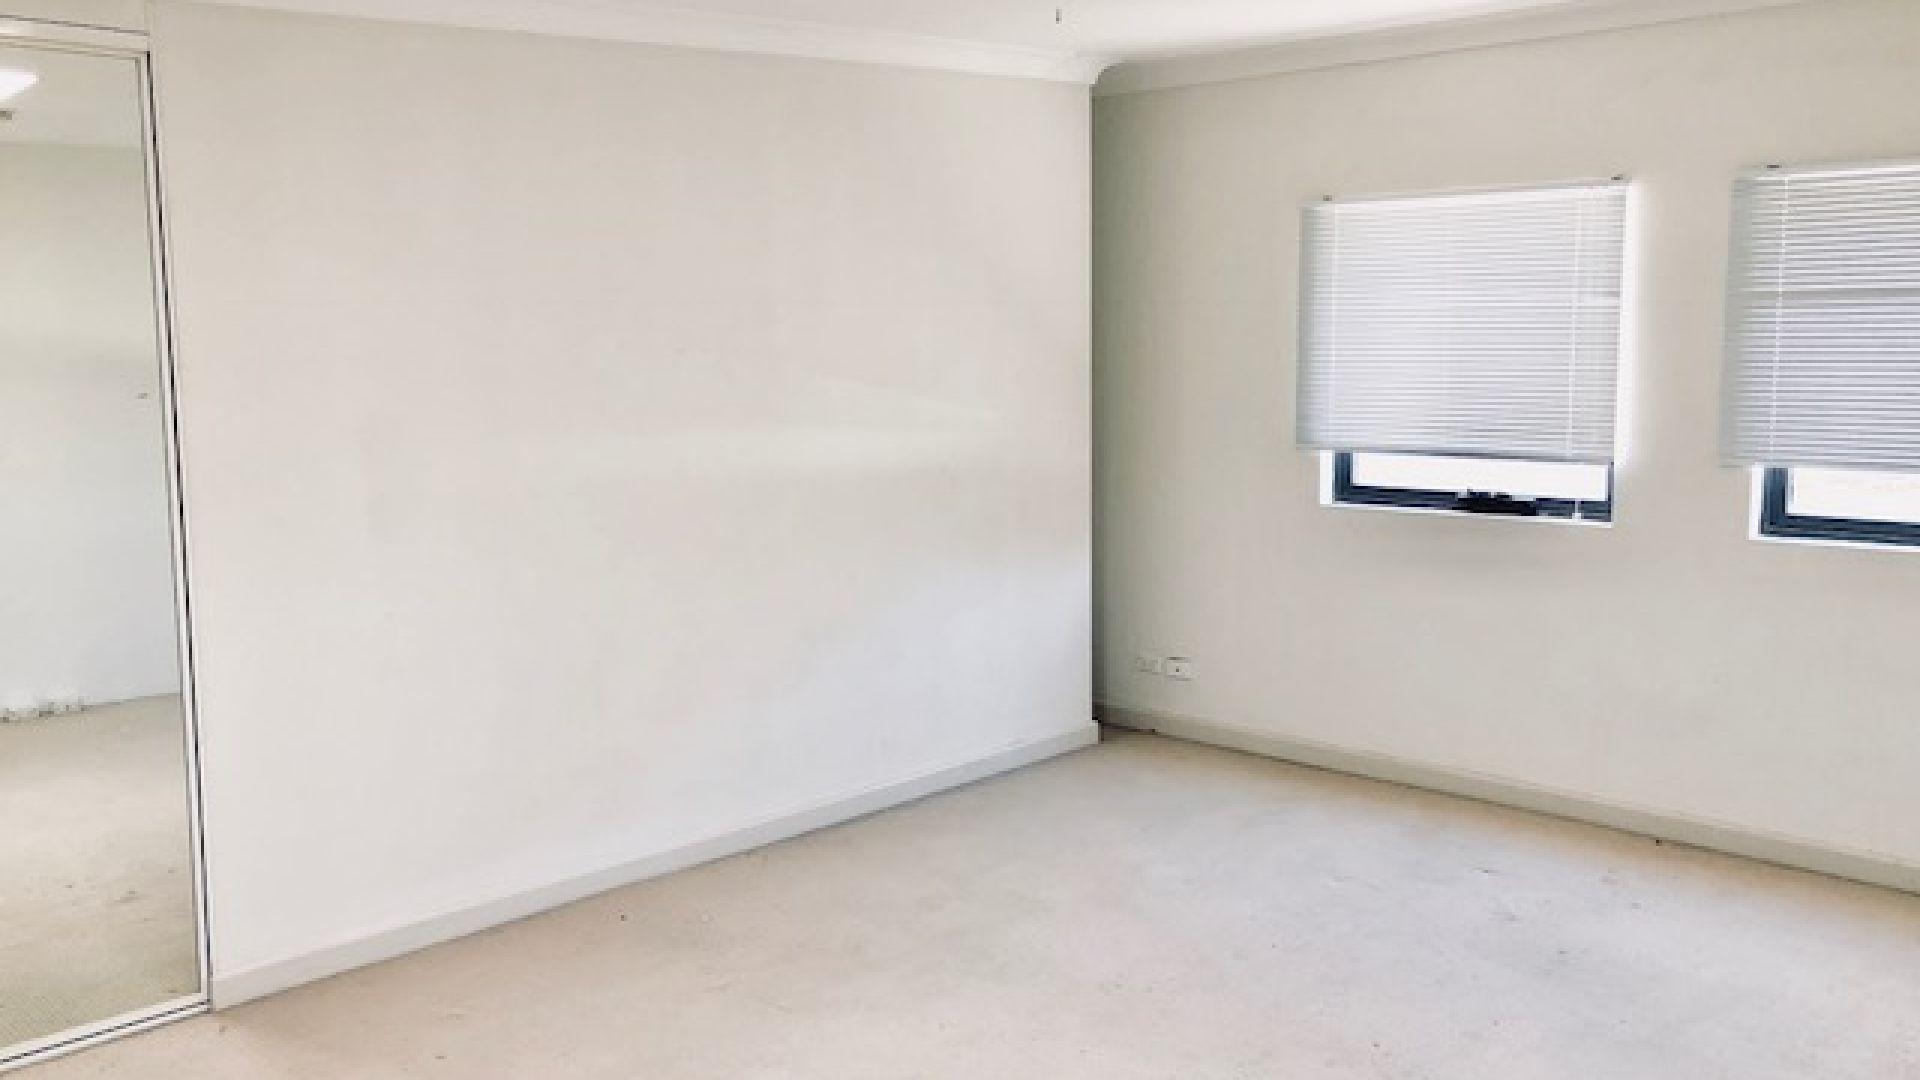 114/140 Parramatta  Road, Camperdown NSW 2050, Image 1